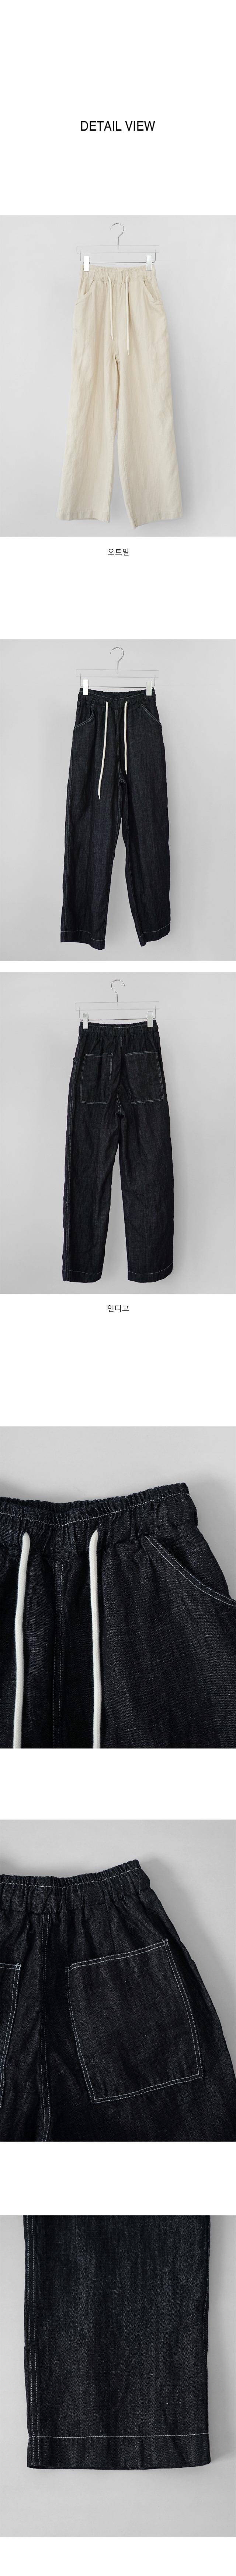 hard texture banding pants